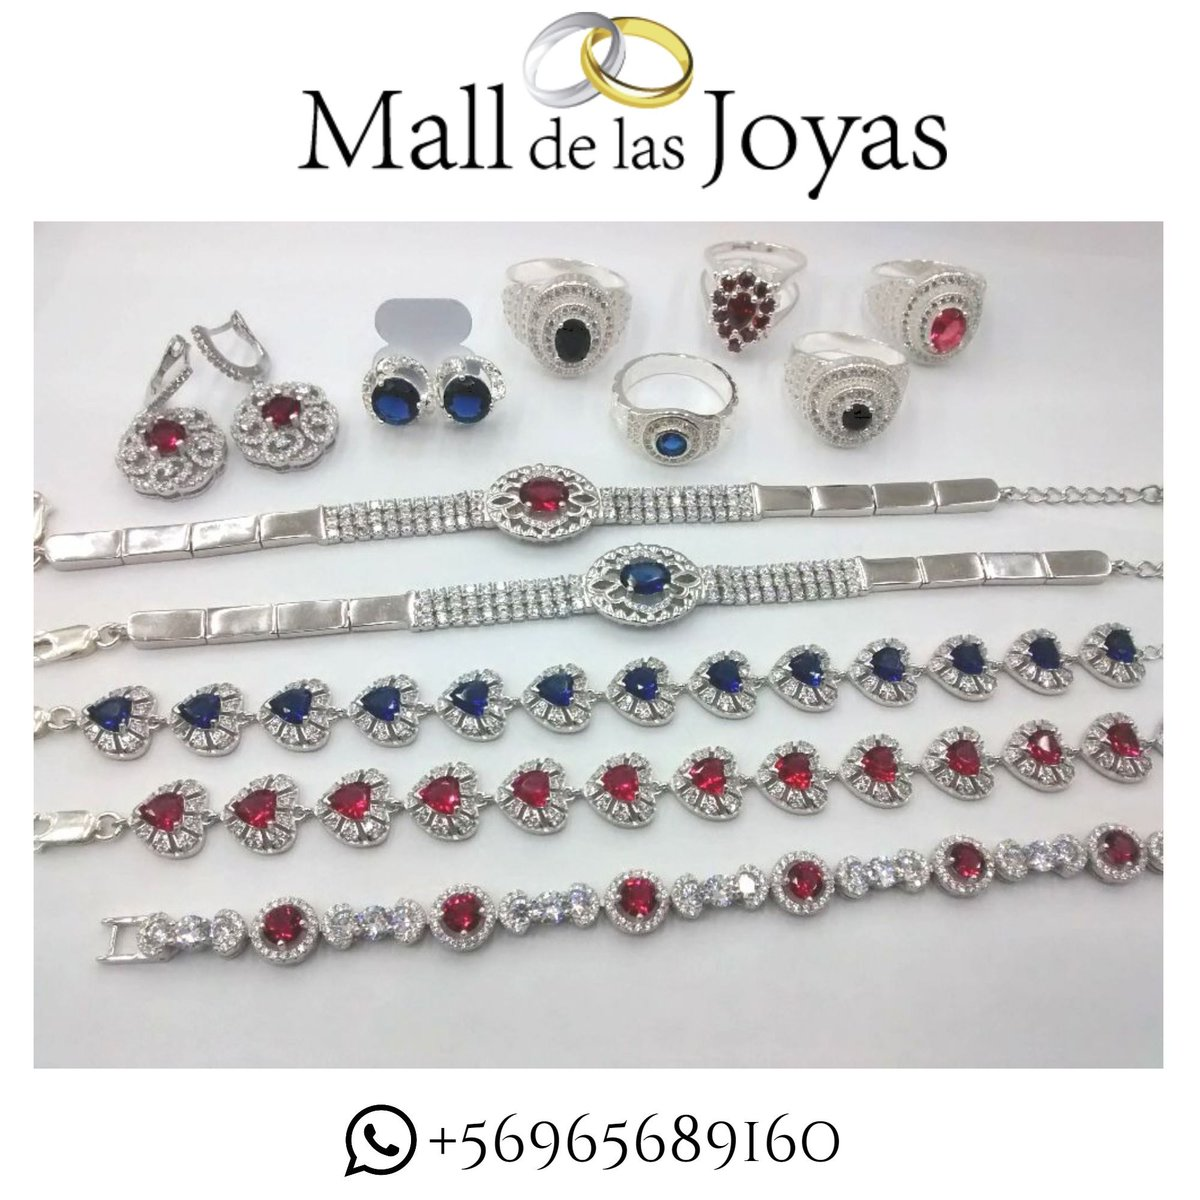 94c7465a0d77  chile  santiago  mayorista  venta  joyeria  joyas  plata  oro  cadenas   anillos… https   t.co 0hWSDRzU1O